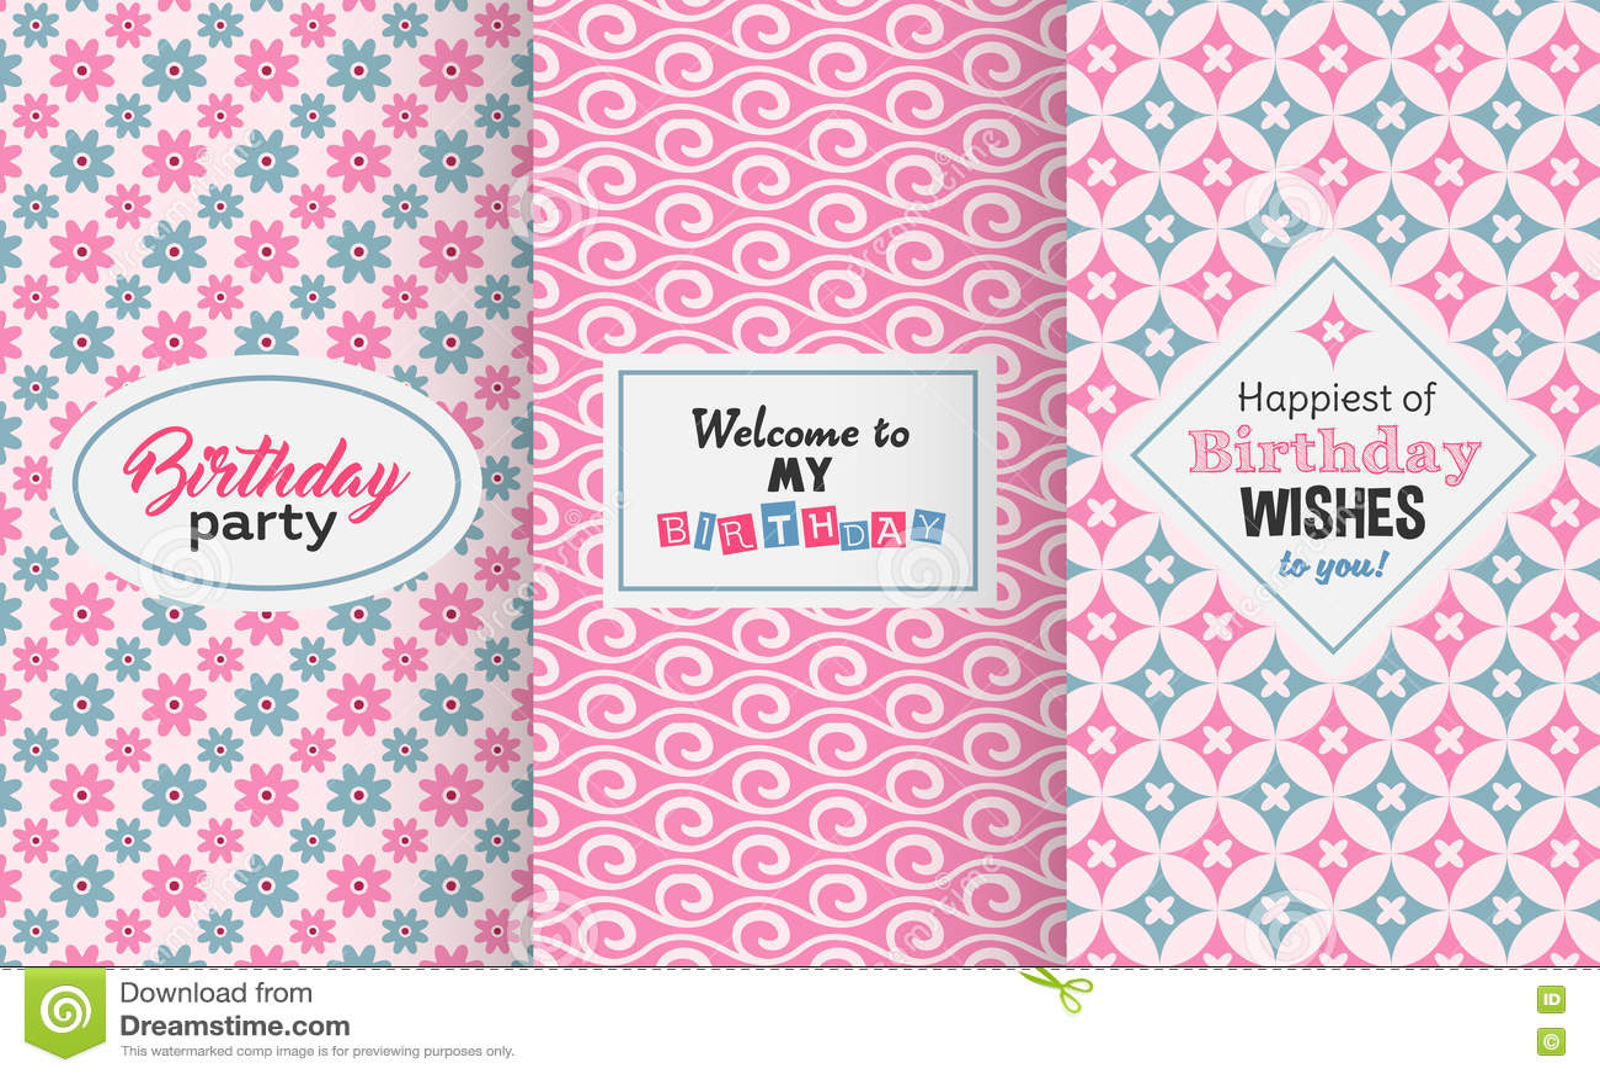 Happy birthday greetings invitation cute seamless pattern set happy birthday greetings invitation cute seamless pattern set m4hsunfo